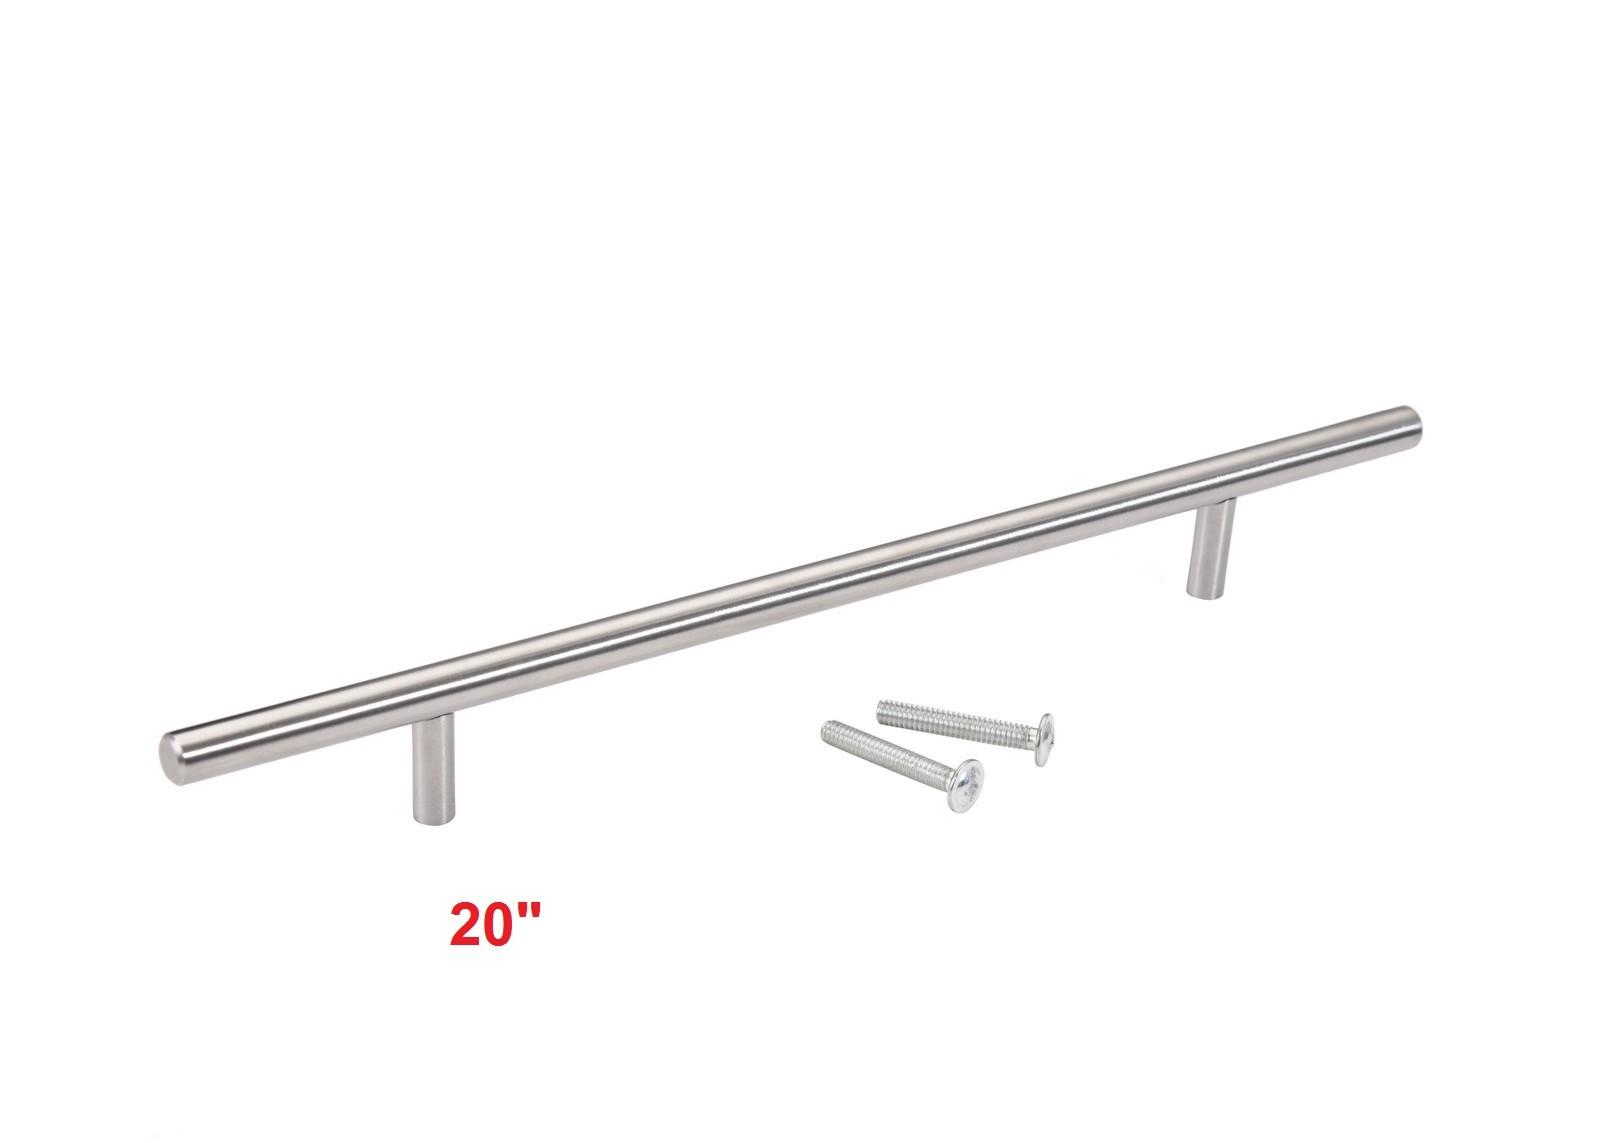 Stainless Steel T Bar Kitchen Cabinet Door Hardware Pulls Handles ...